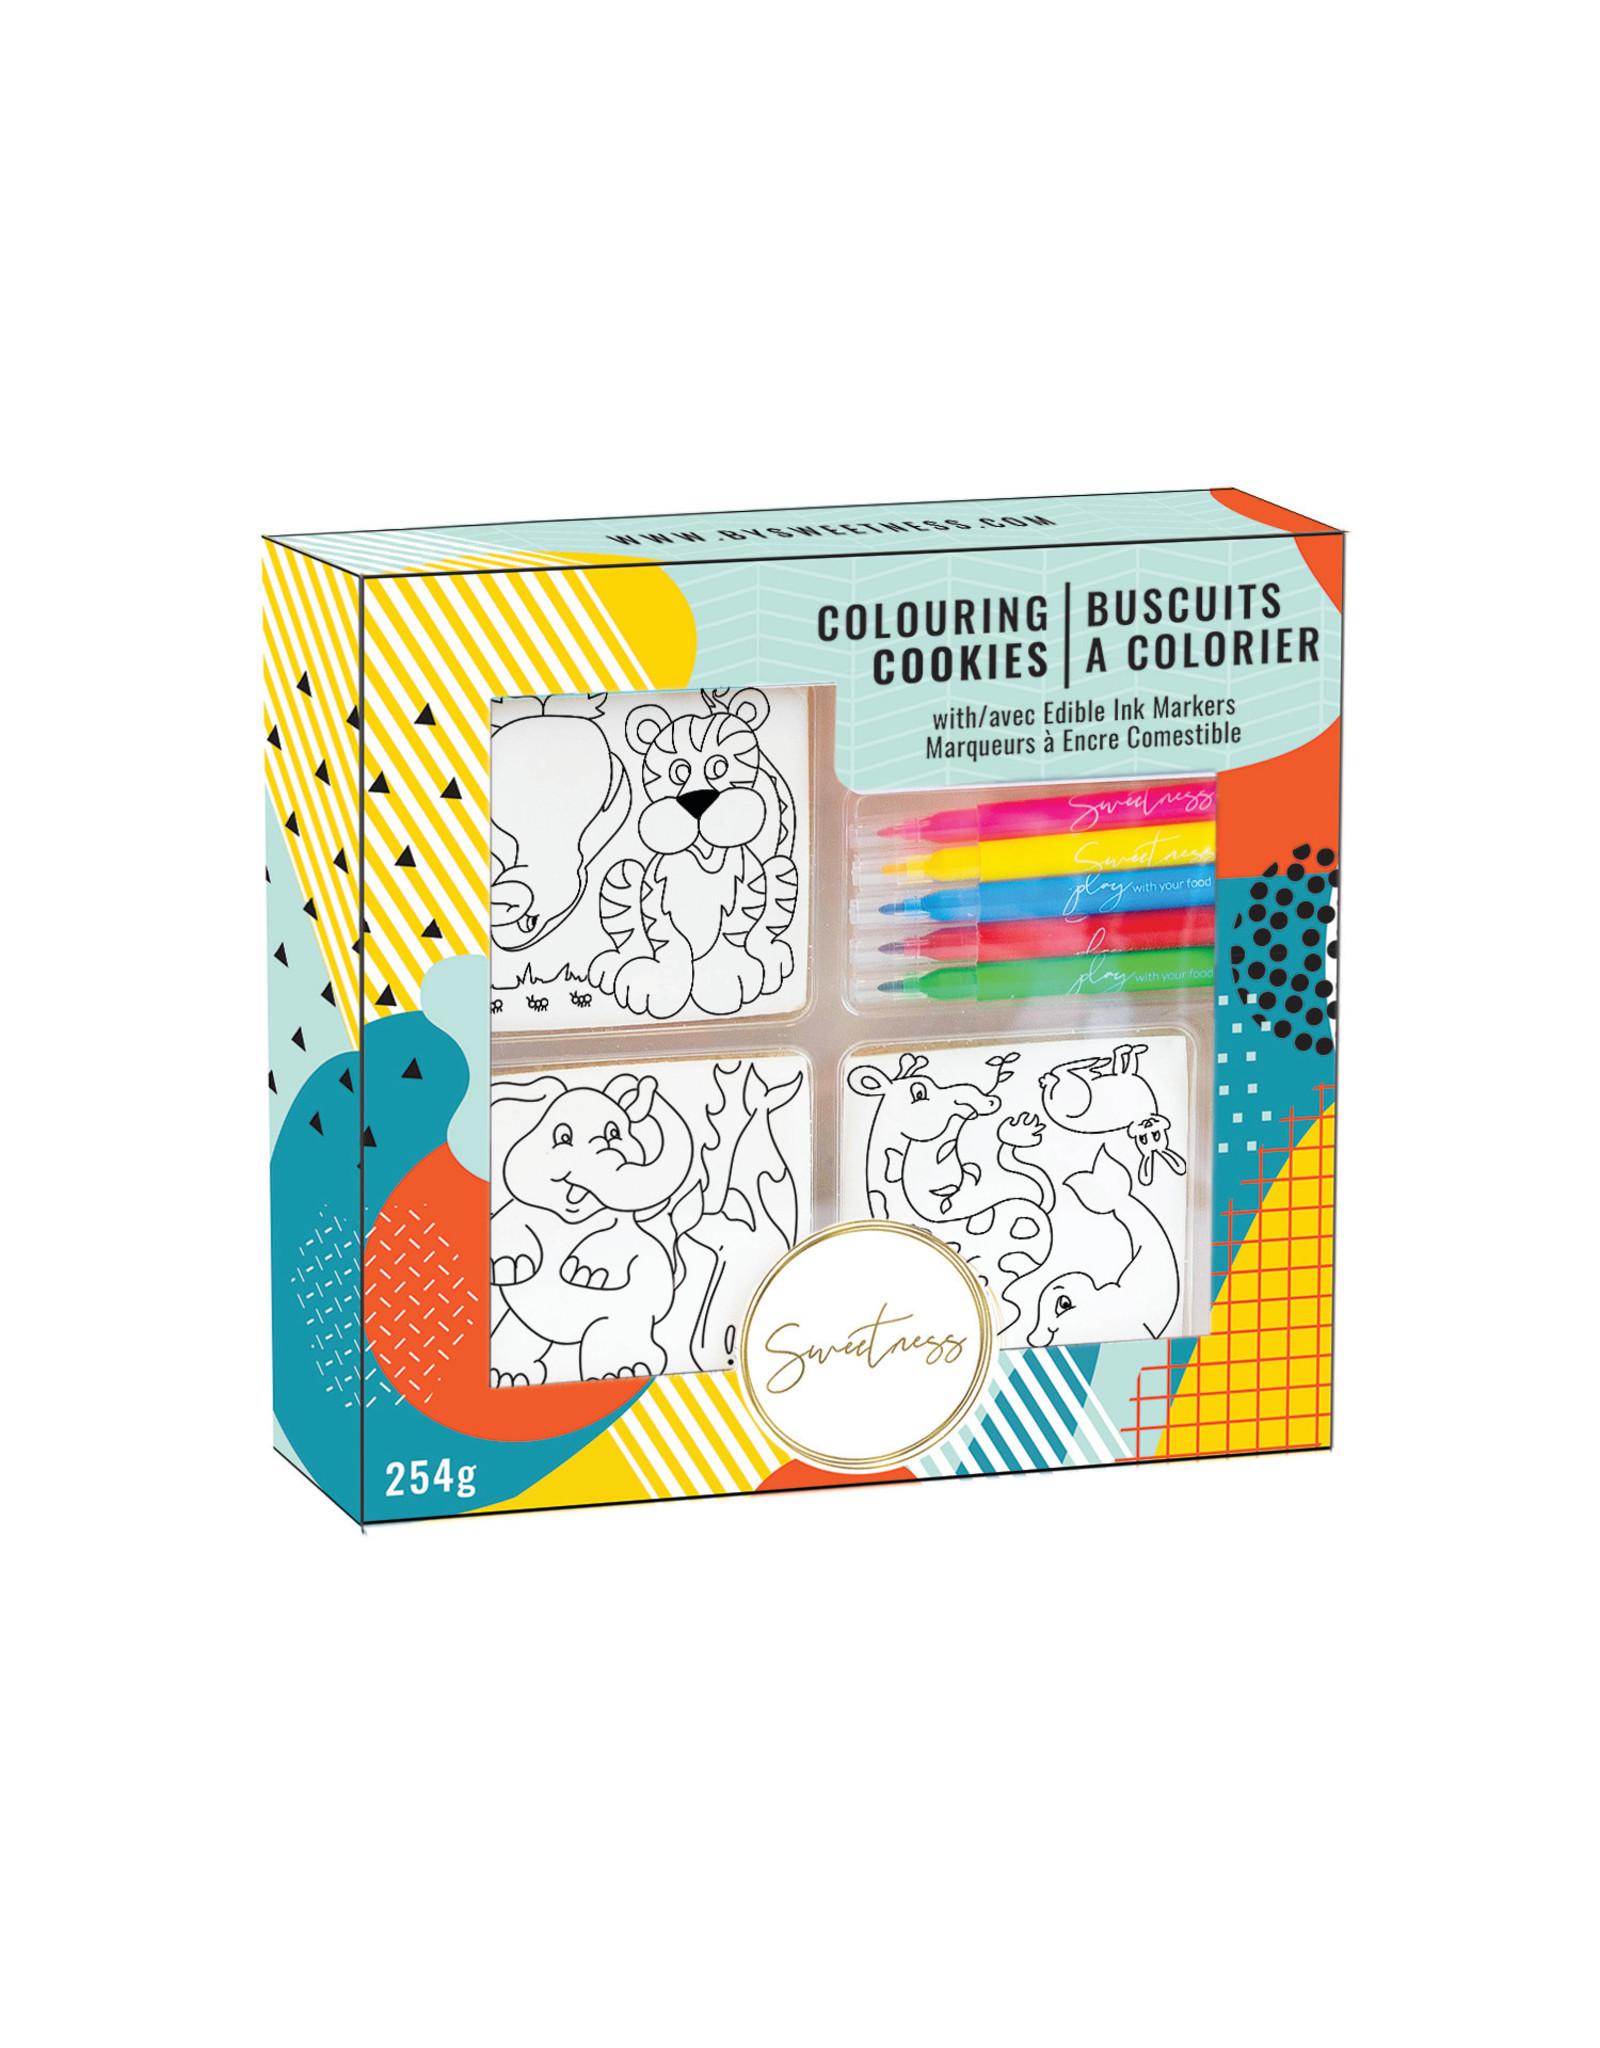 Sweetness Colouring Sugar Cookies - Animal Friends